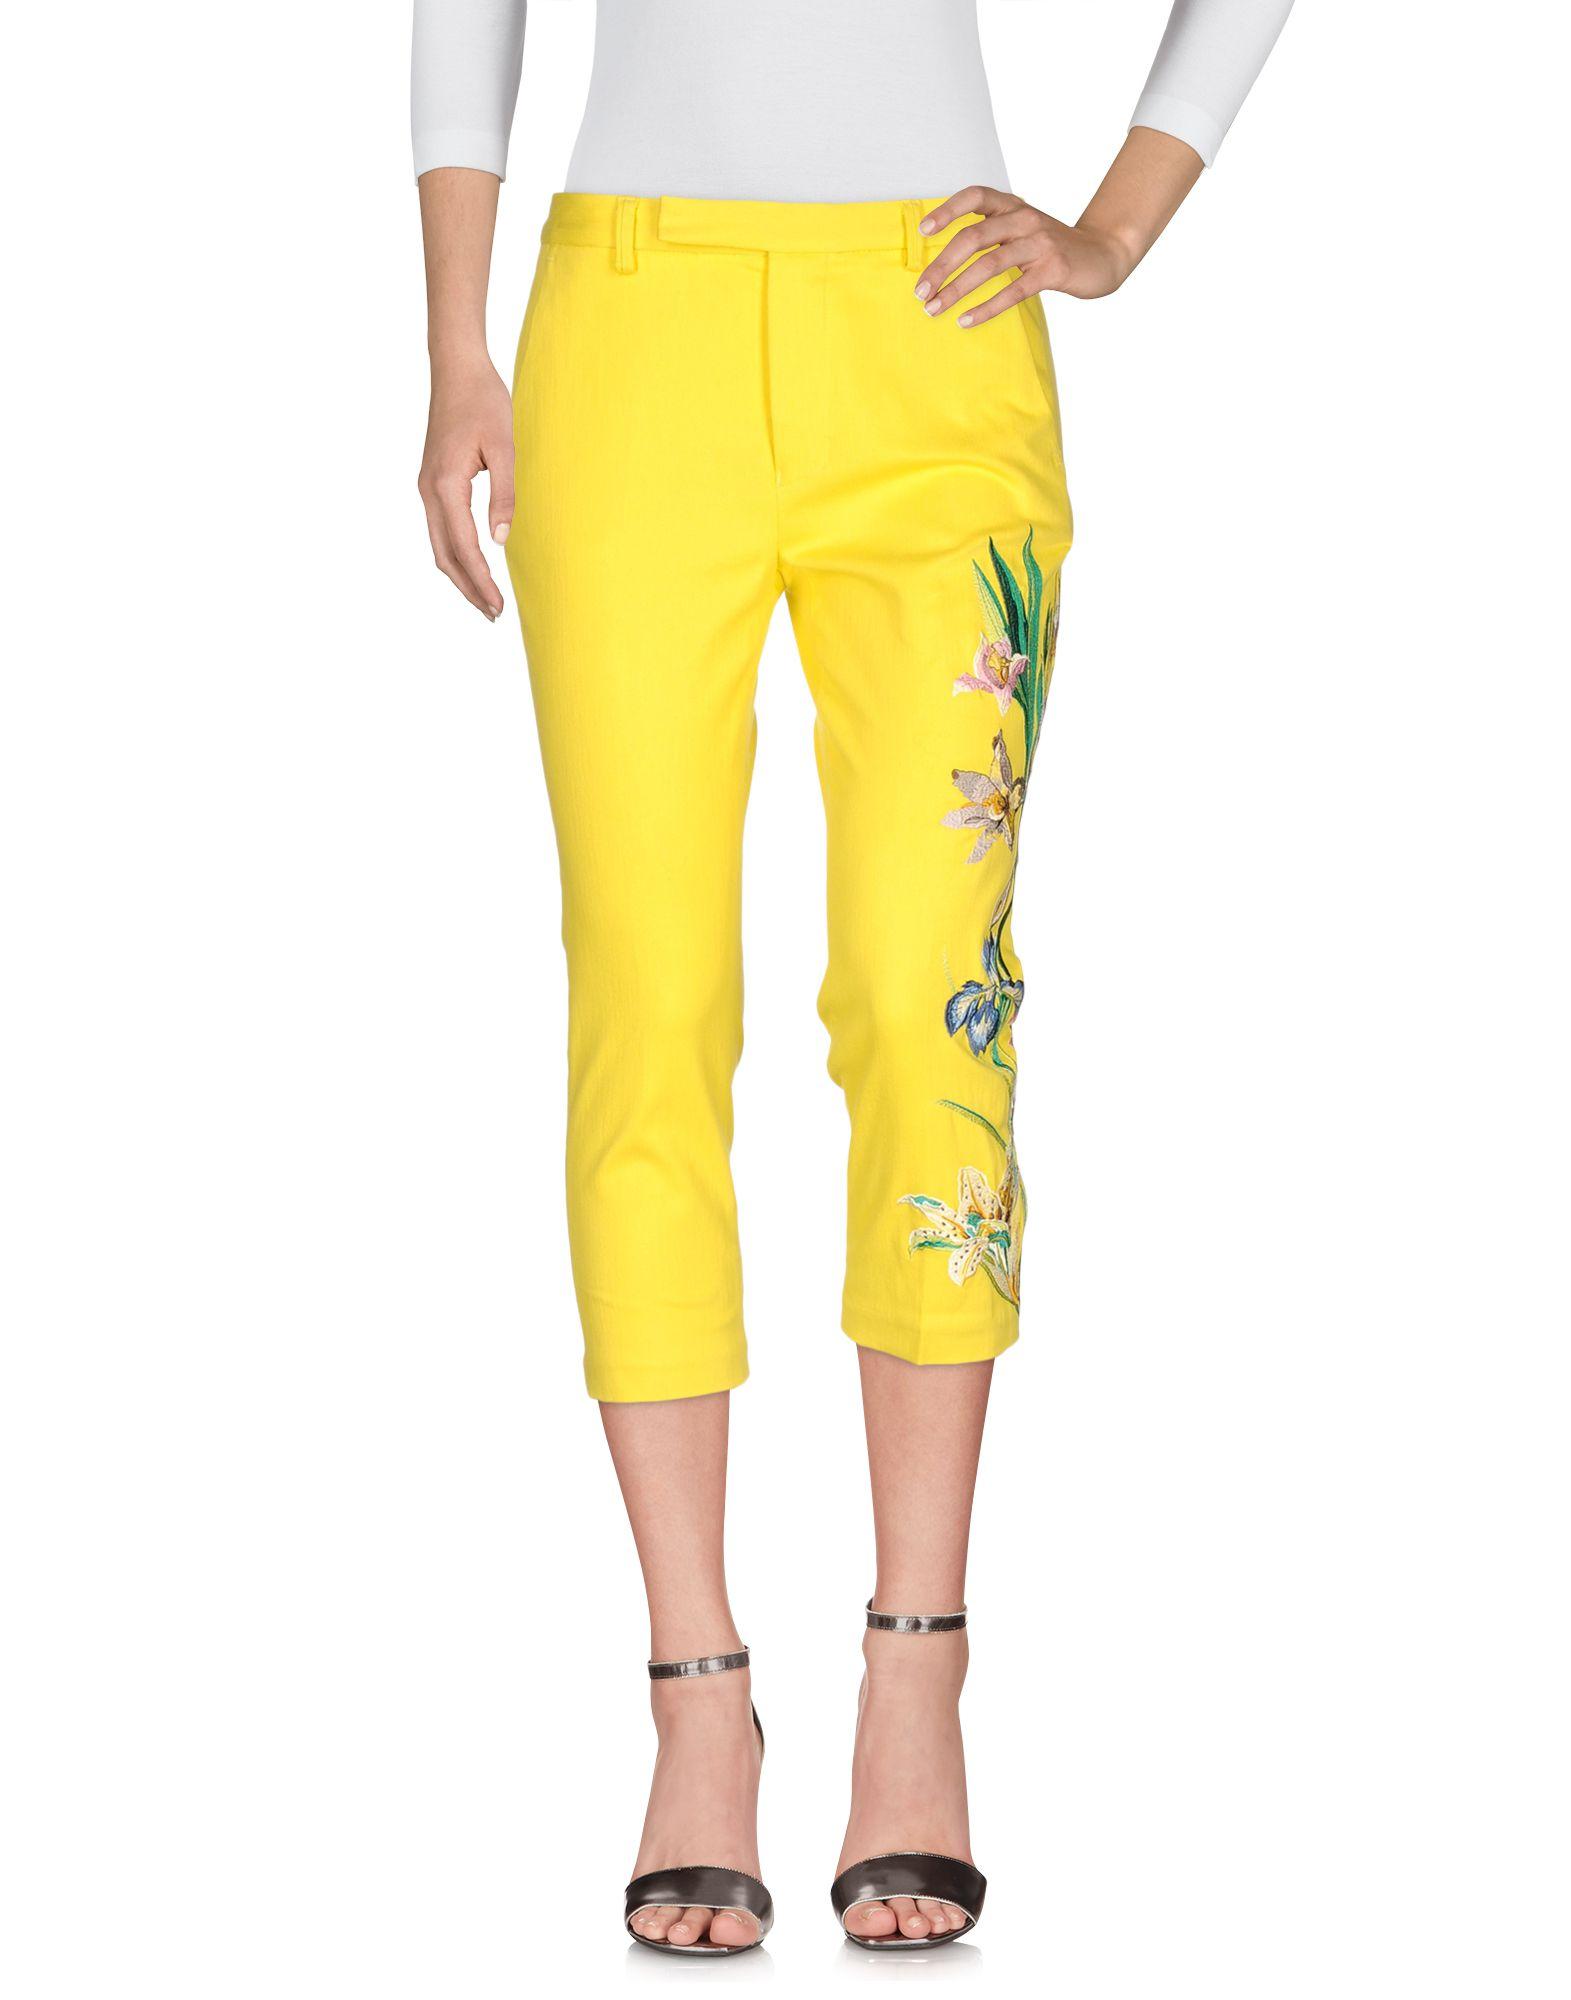 Pantaloni Jeans Femme By Michele Rossi Donna - Acquista online su KBL6M